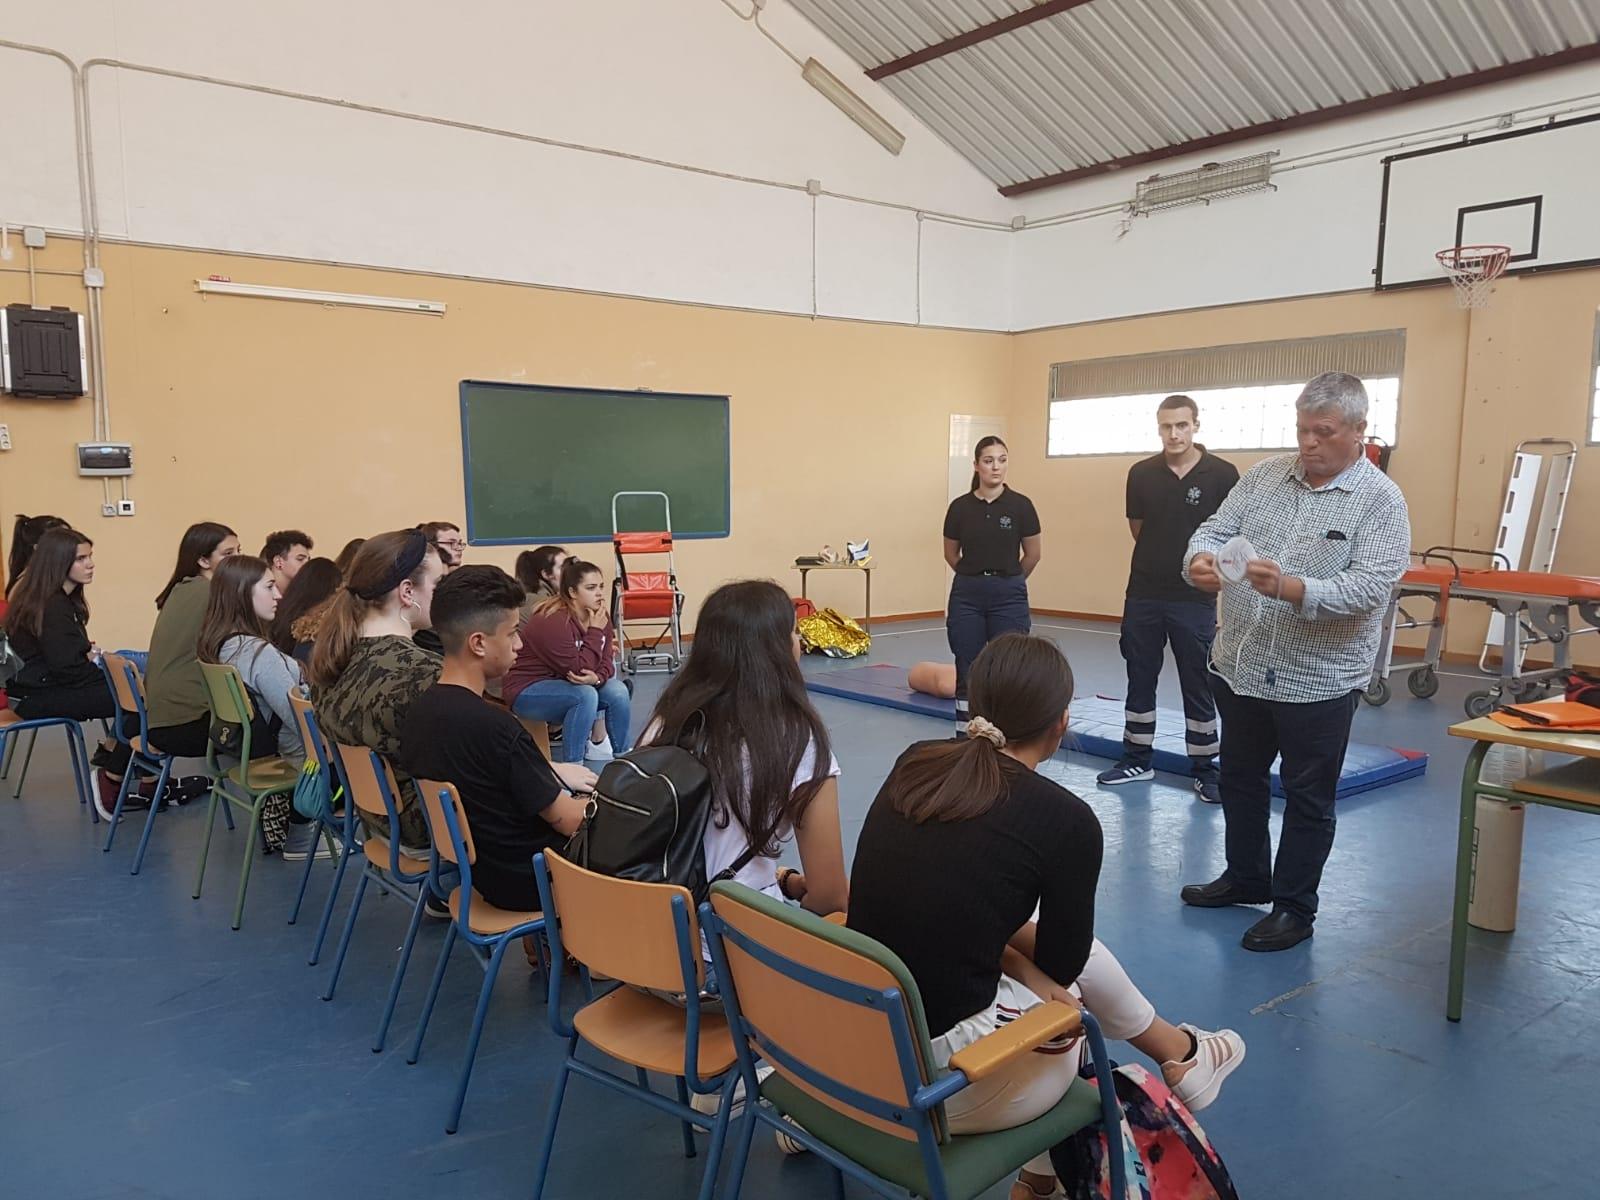 visita-CF-Motril-Salobreña-2019-05